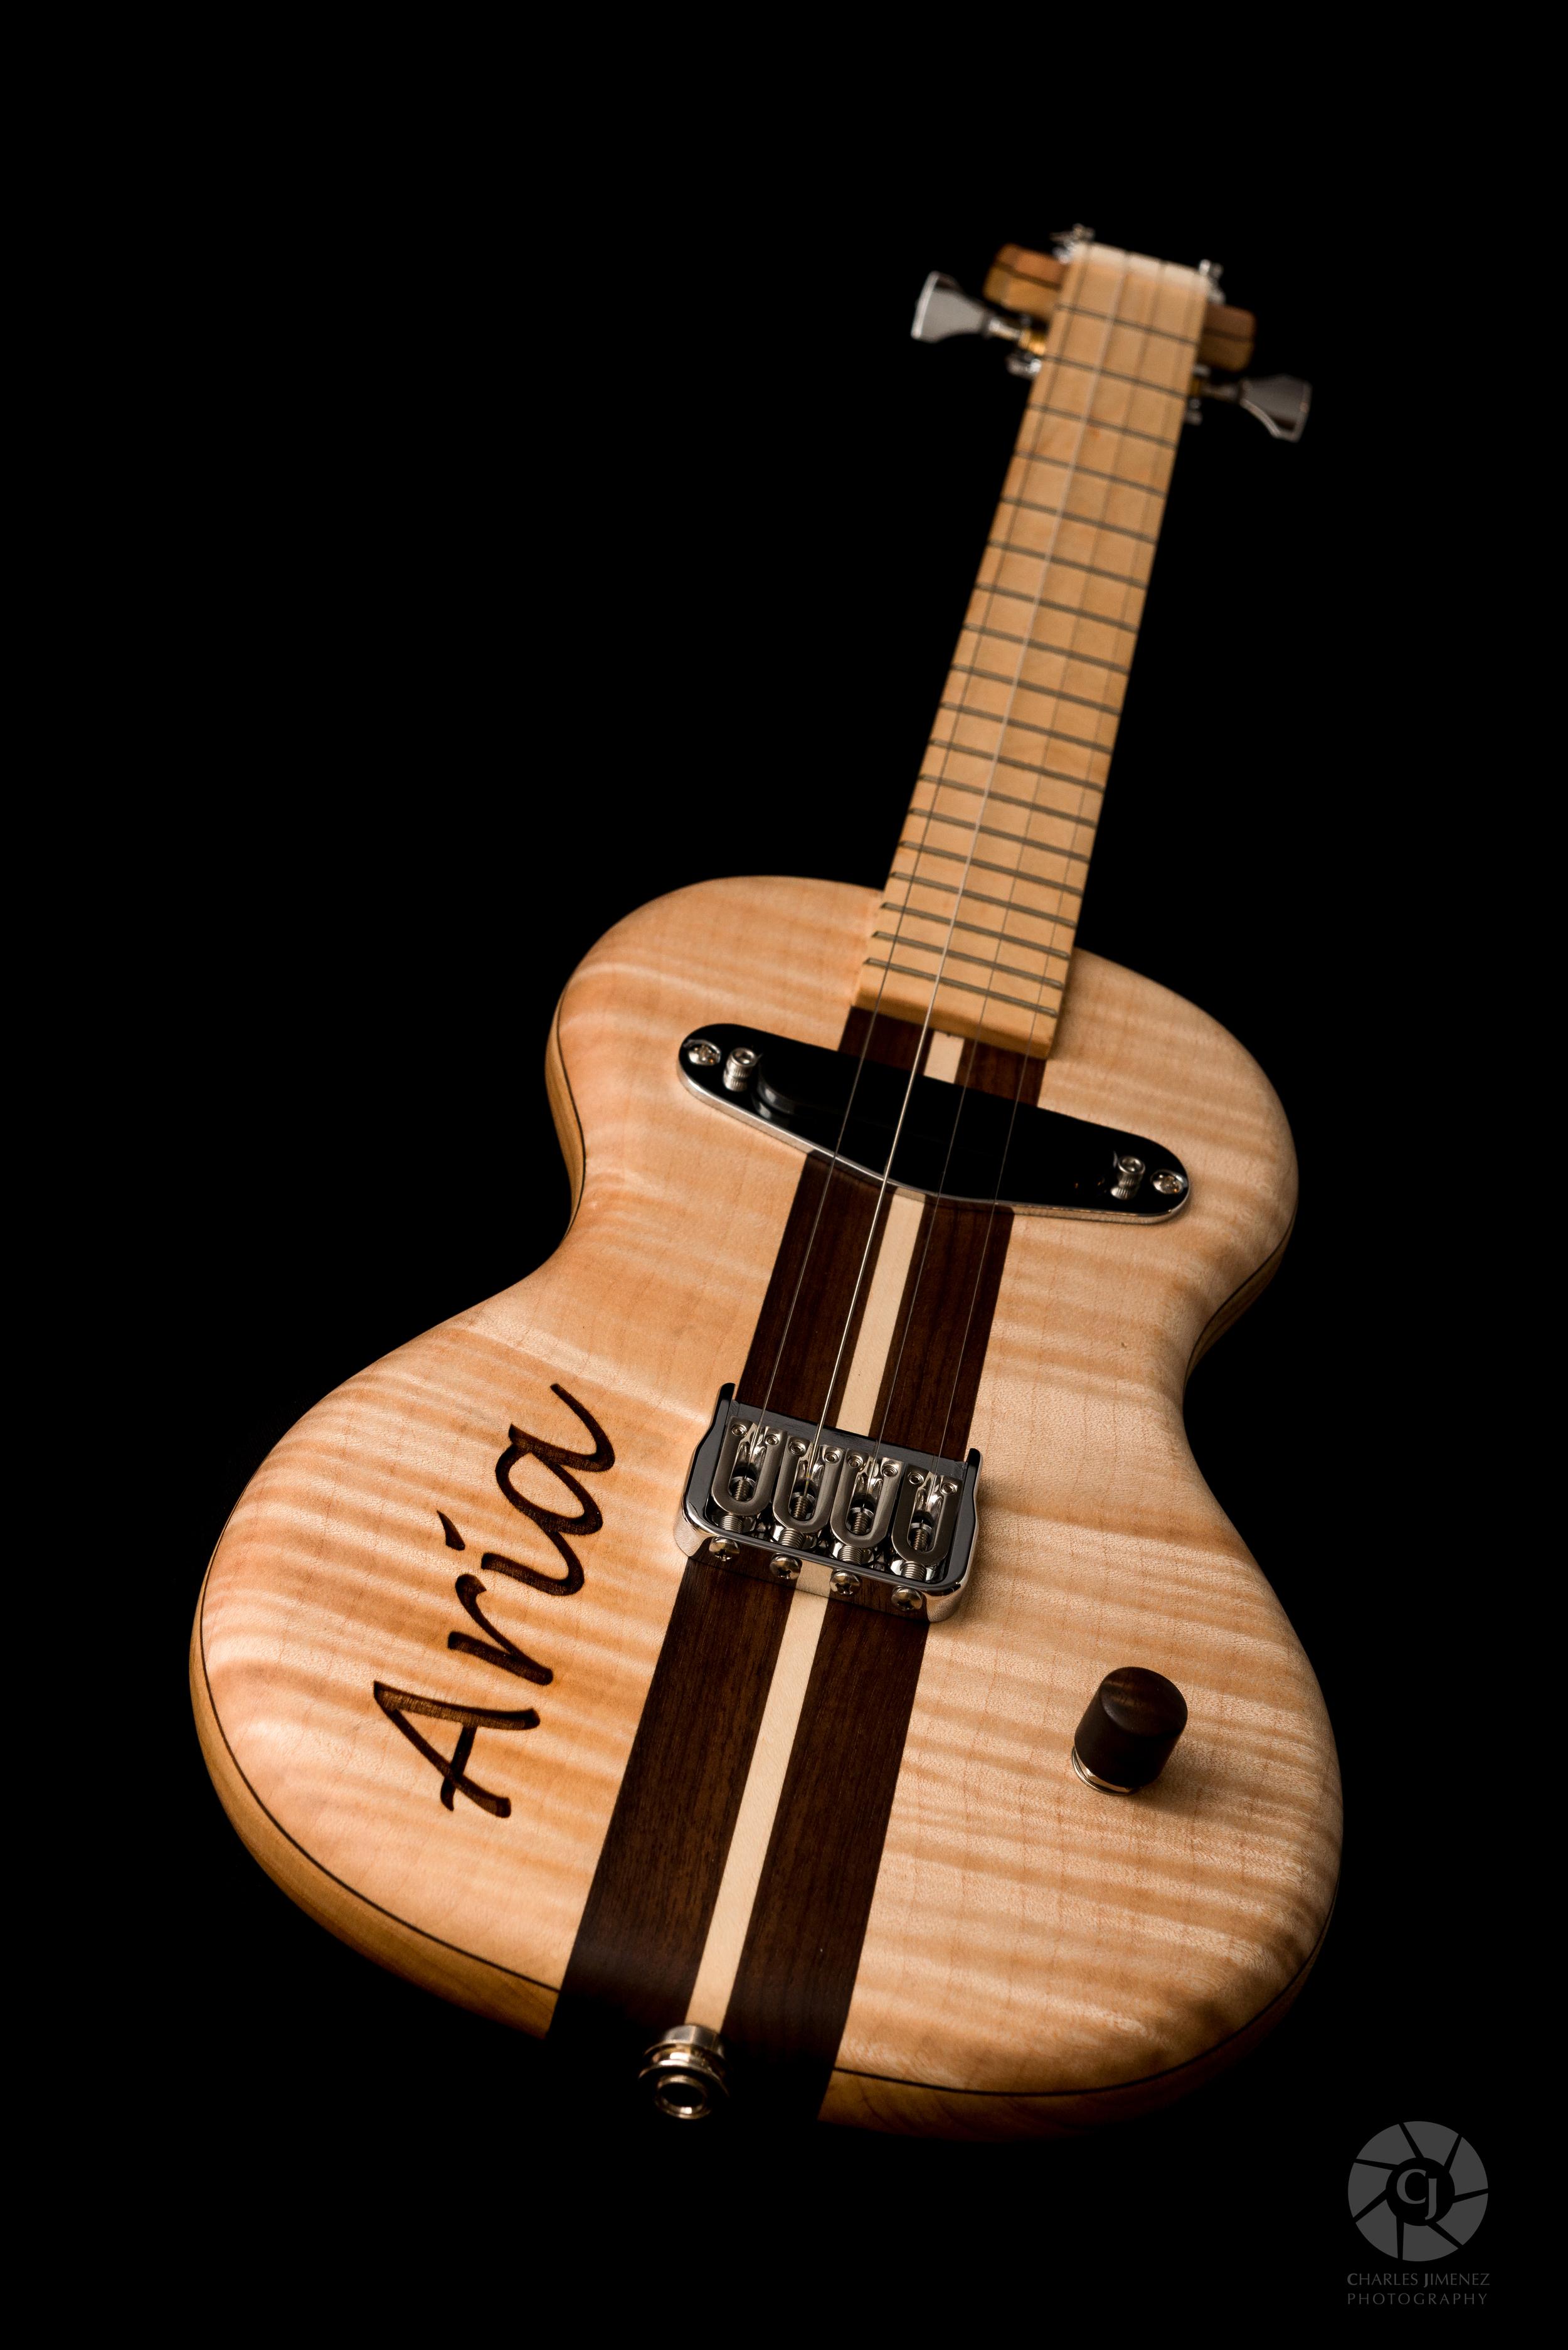 Better Mousetrap Guitars_Aria Ukulele_8-25-13_04.jpg